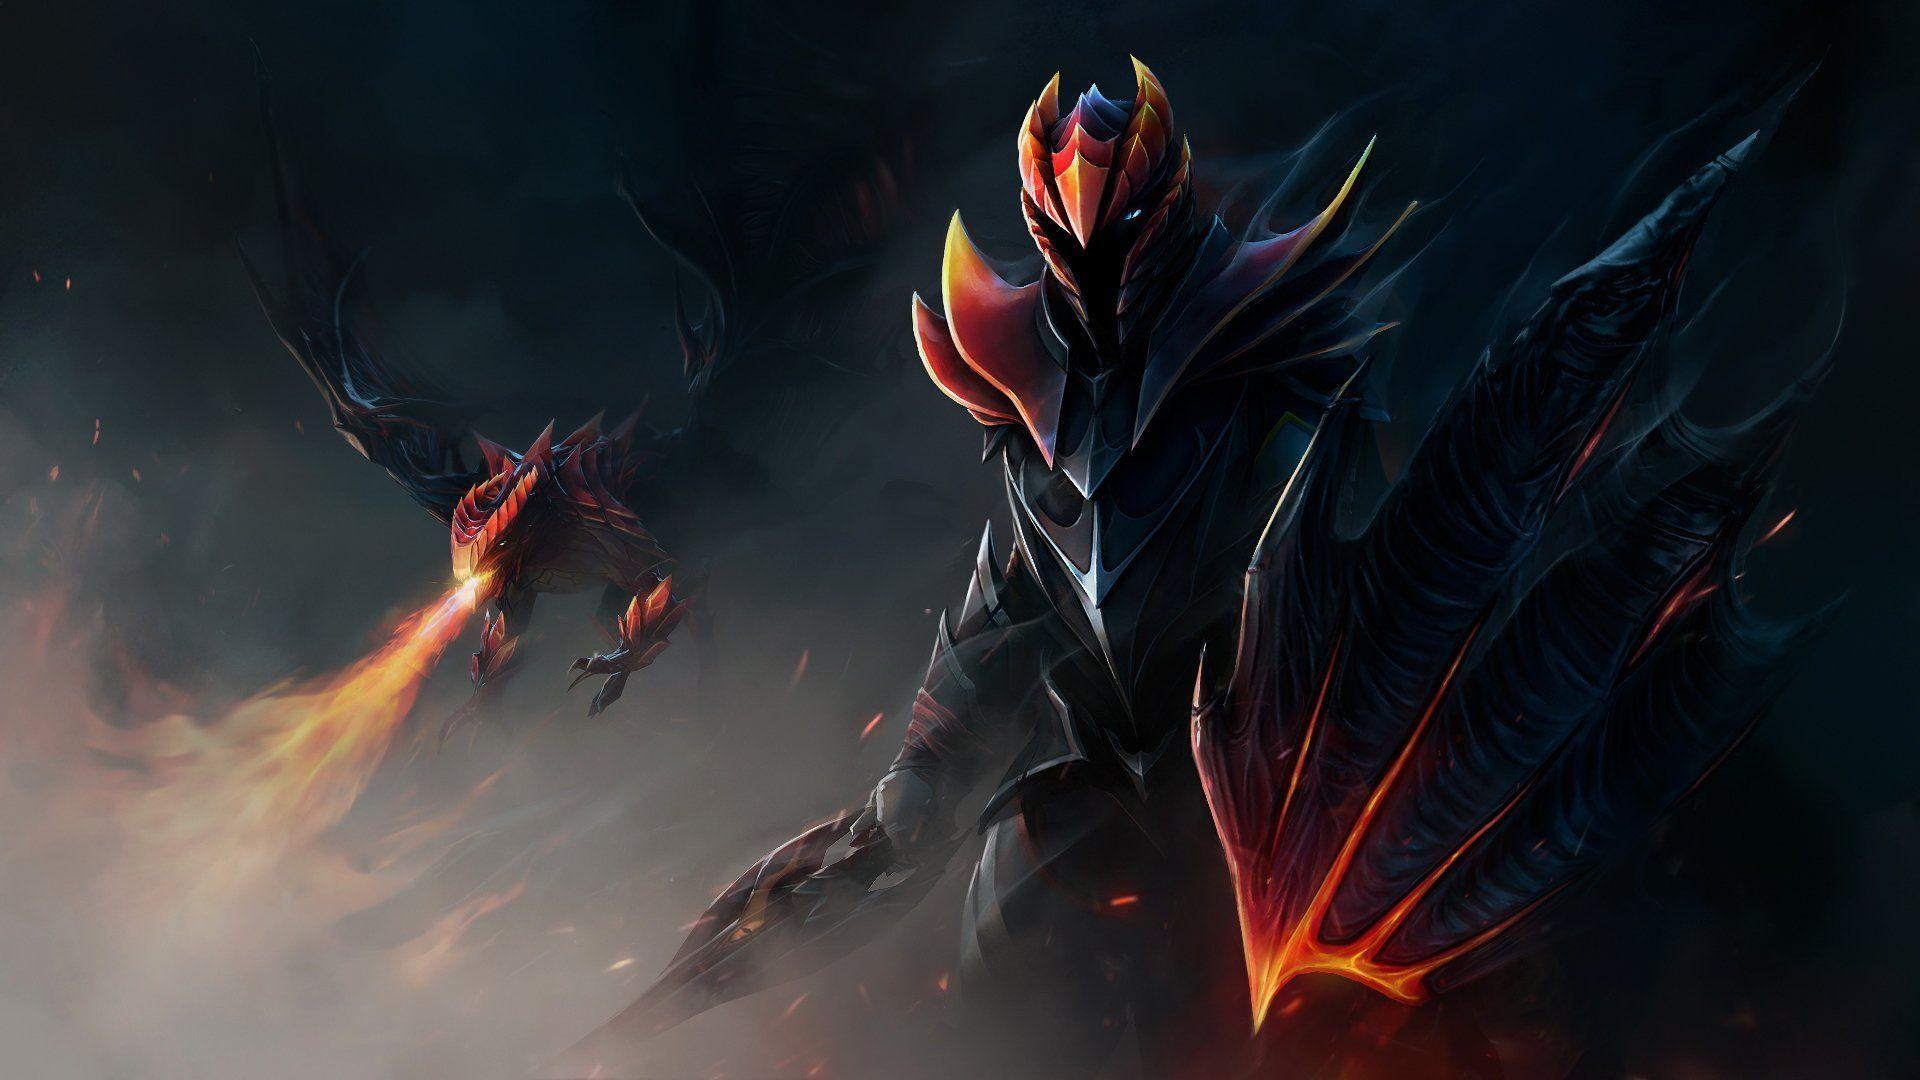 Dragon Knight Dota 2 Wallpapers - Top ...